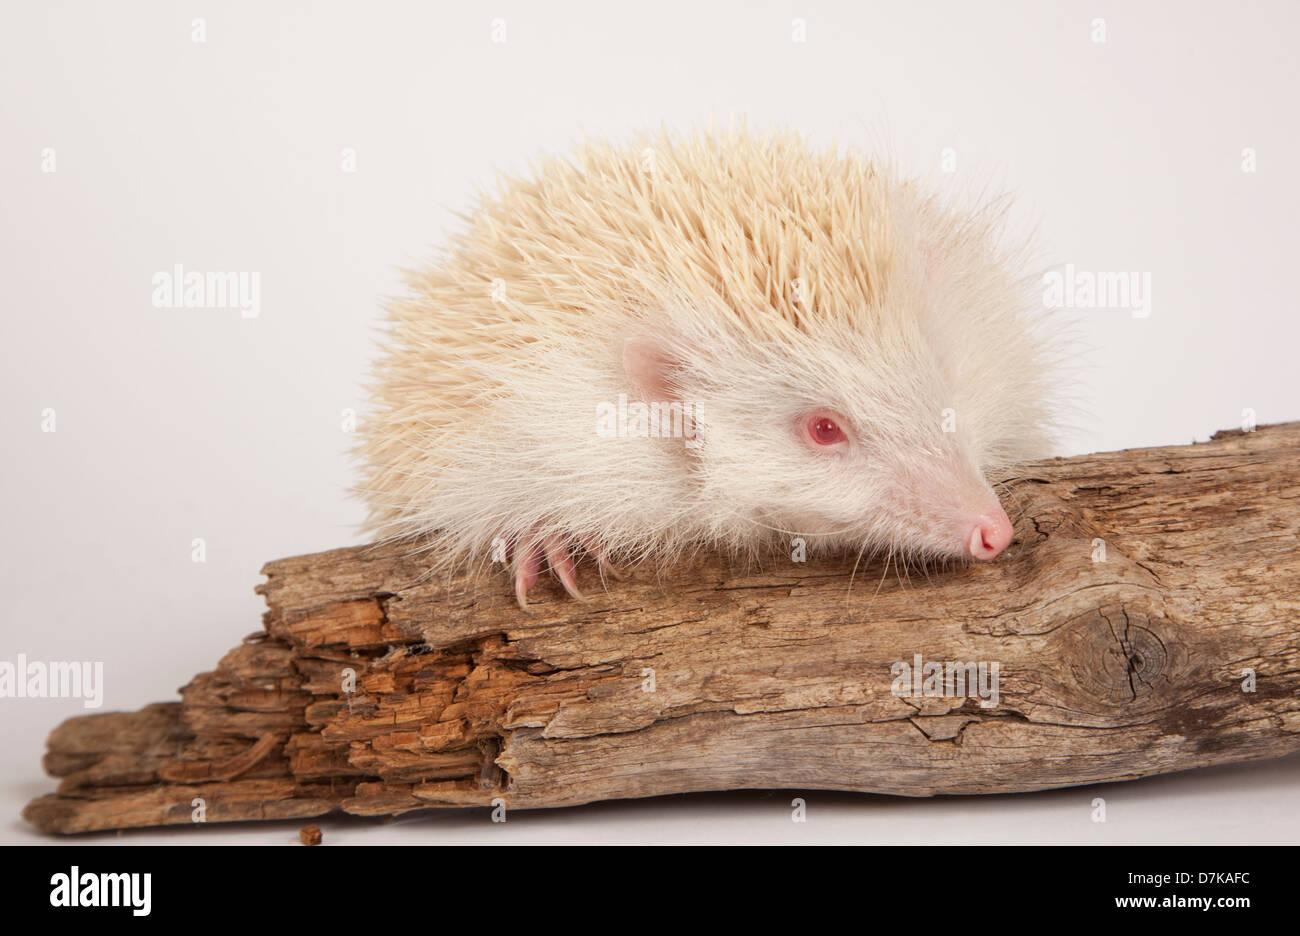 Albino European Hedgehog in Studio - Stock Image